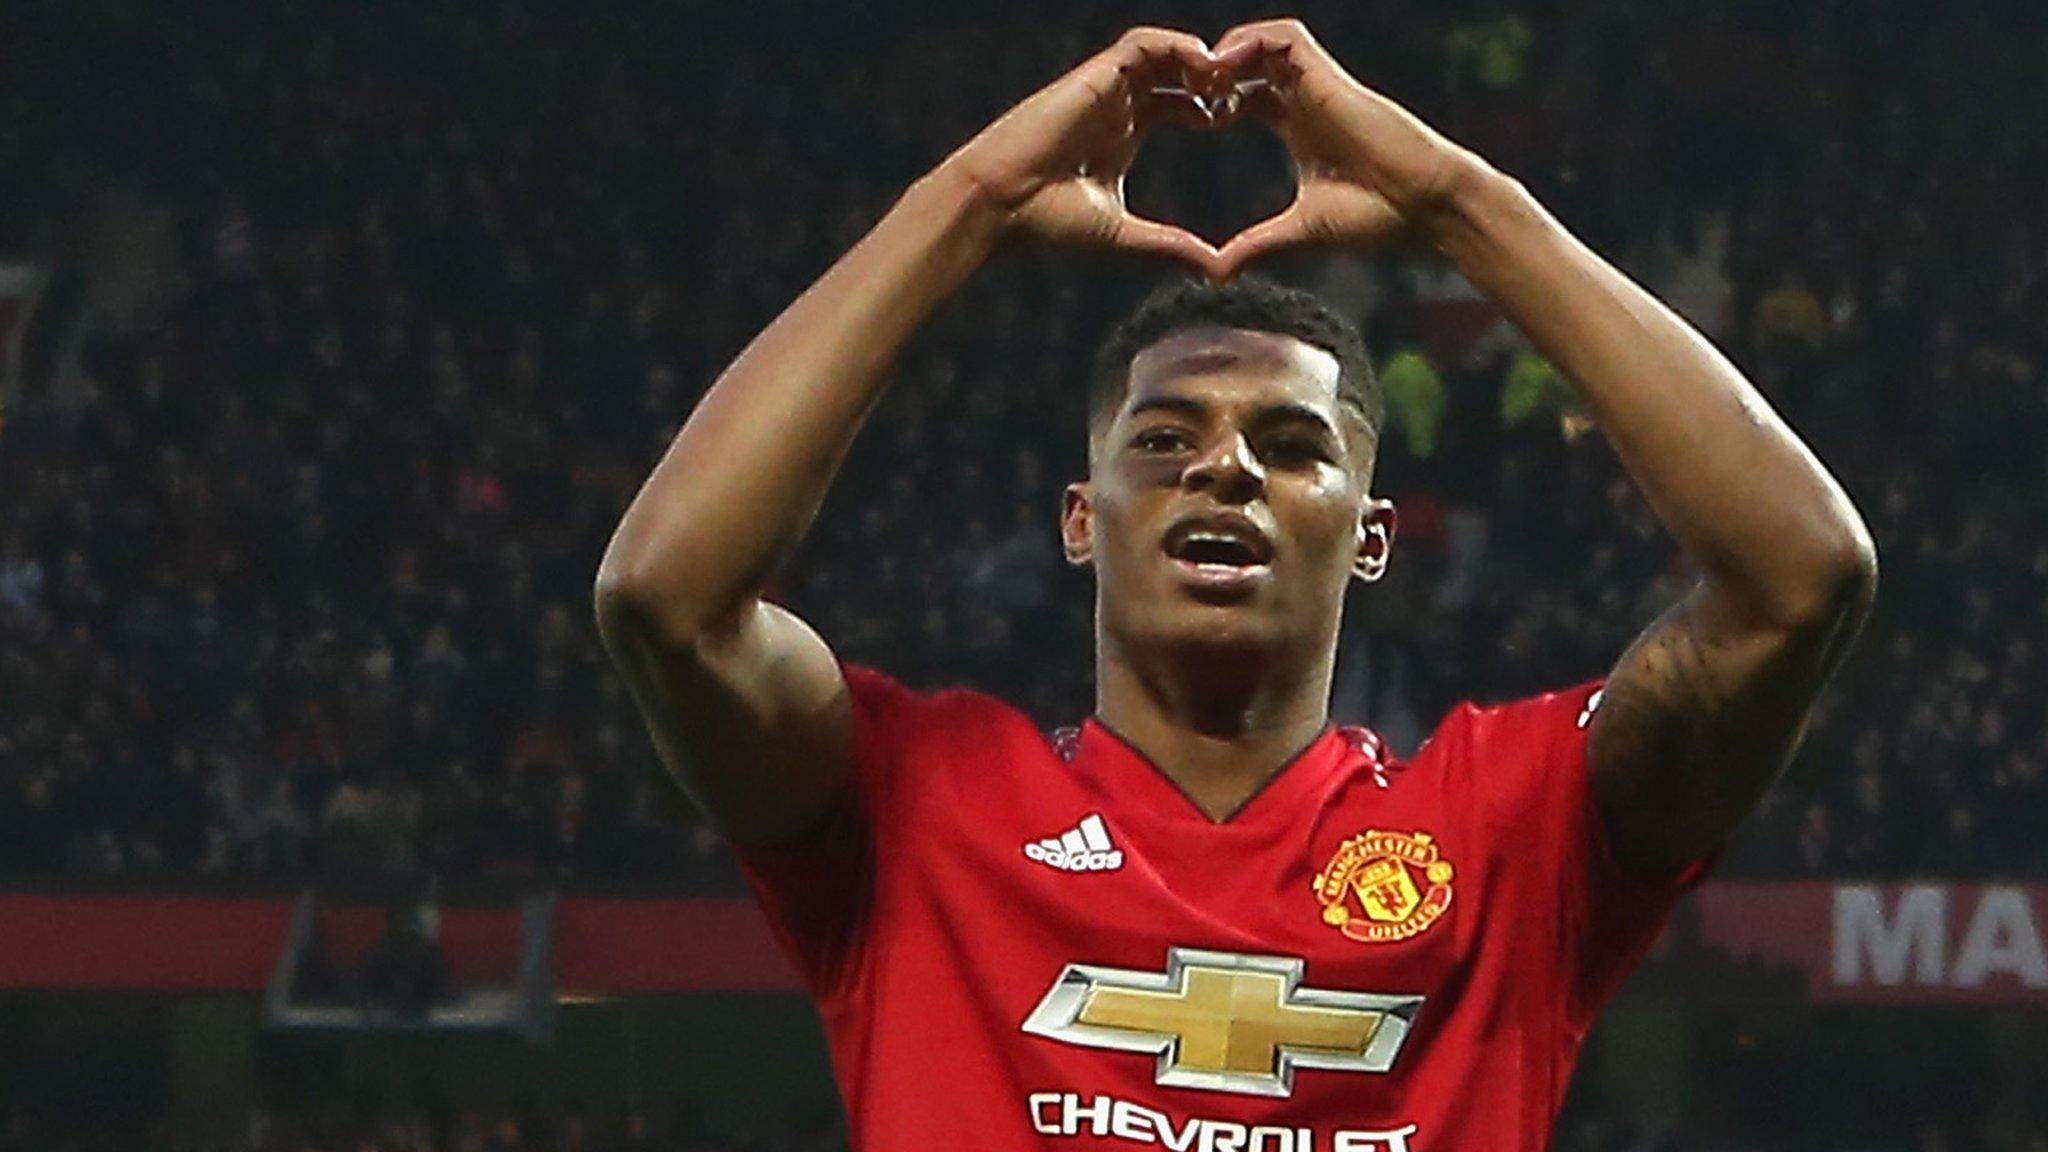 Manchester United 2-1 Brighton: Rashford's 'calm, assured' finishing praised by Solskjaer